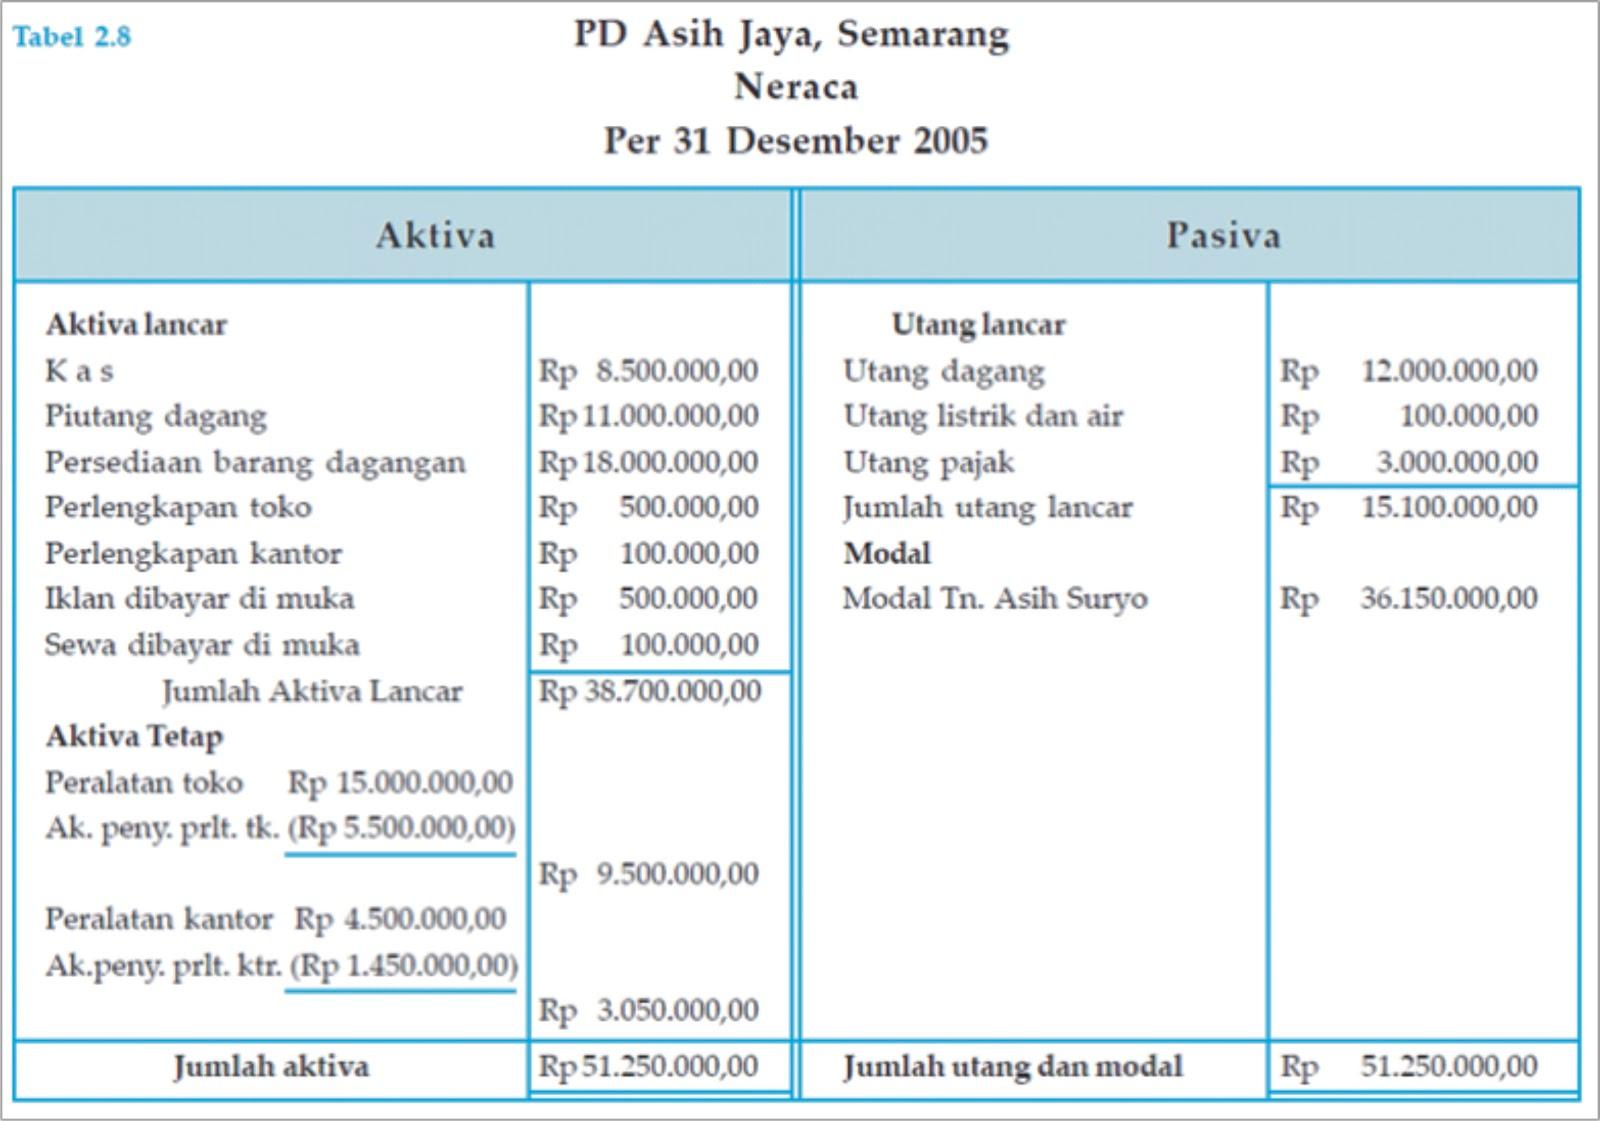 Contoh Format Laporan Keuangan Koperasi Simpan Pinjam Contoh 193